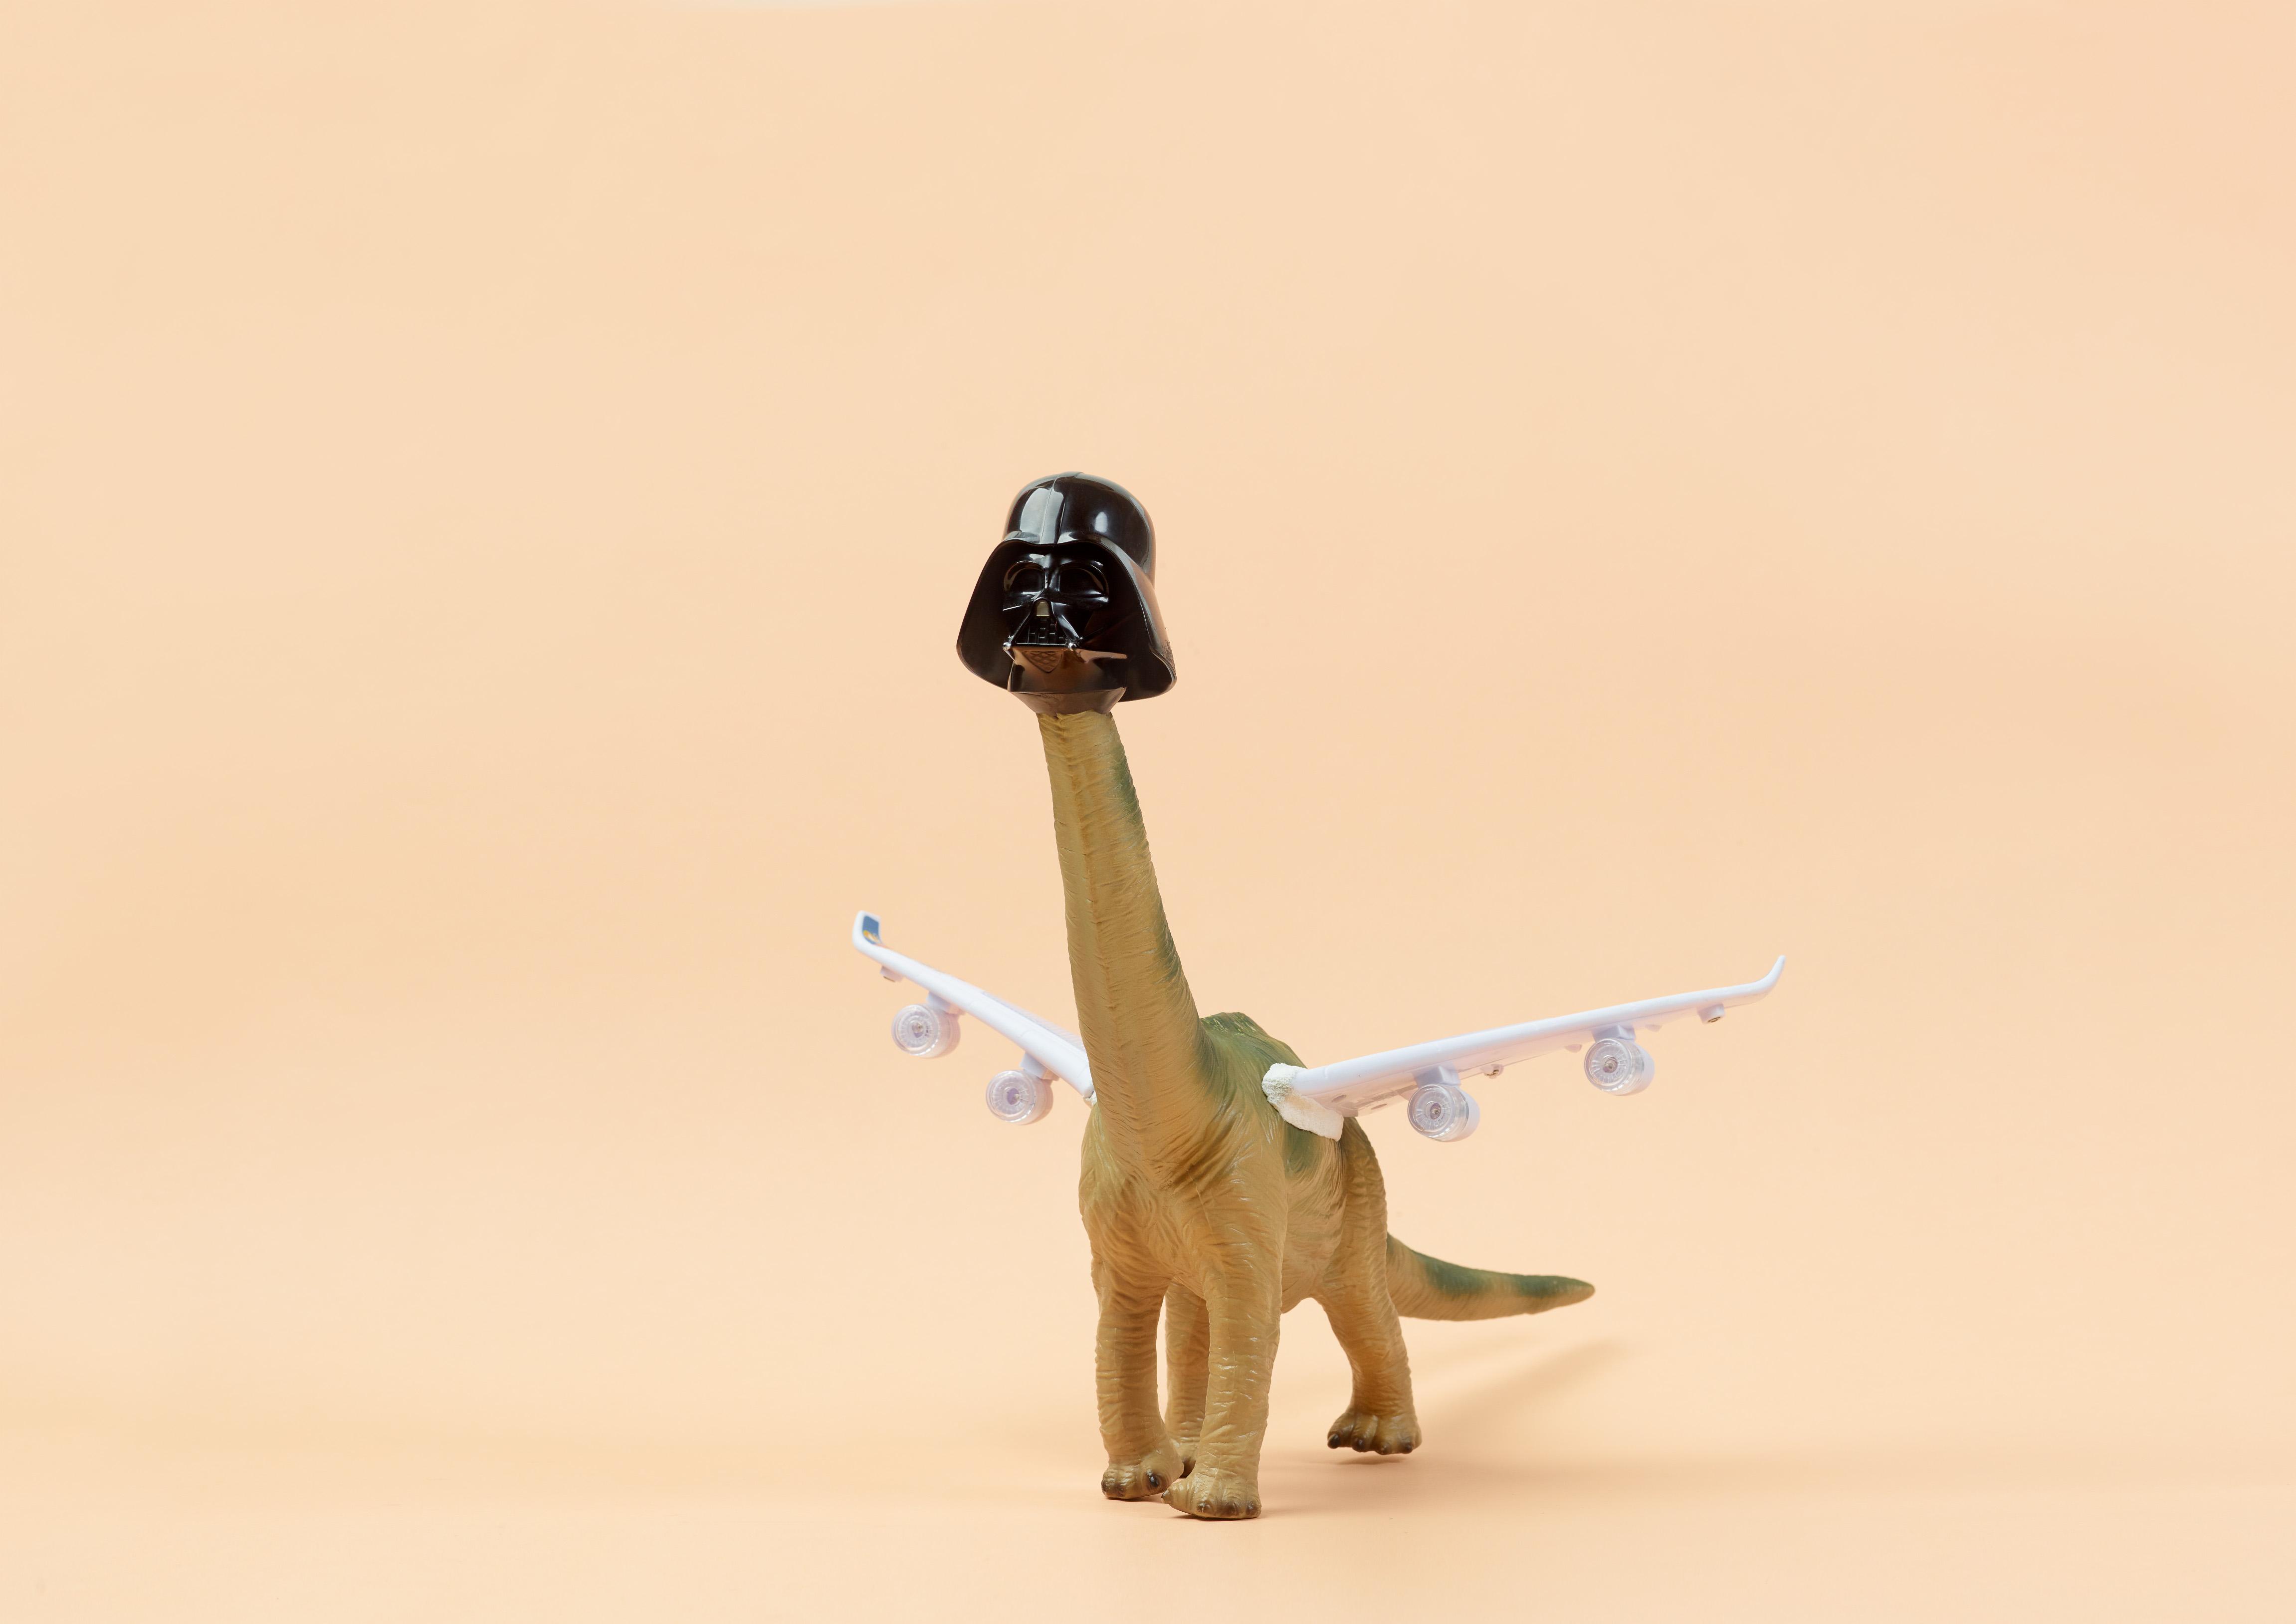 toy dinosaur with darth vader head